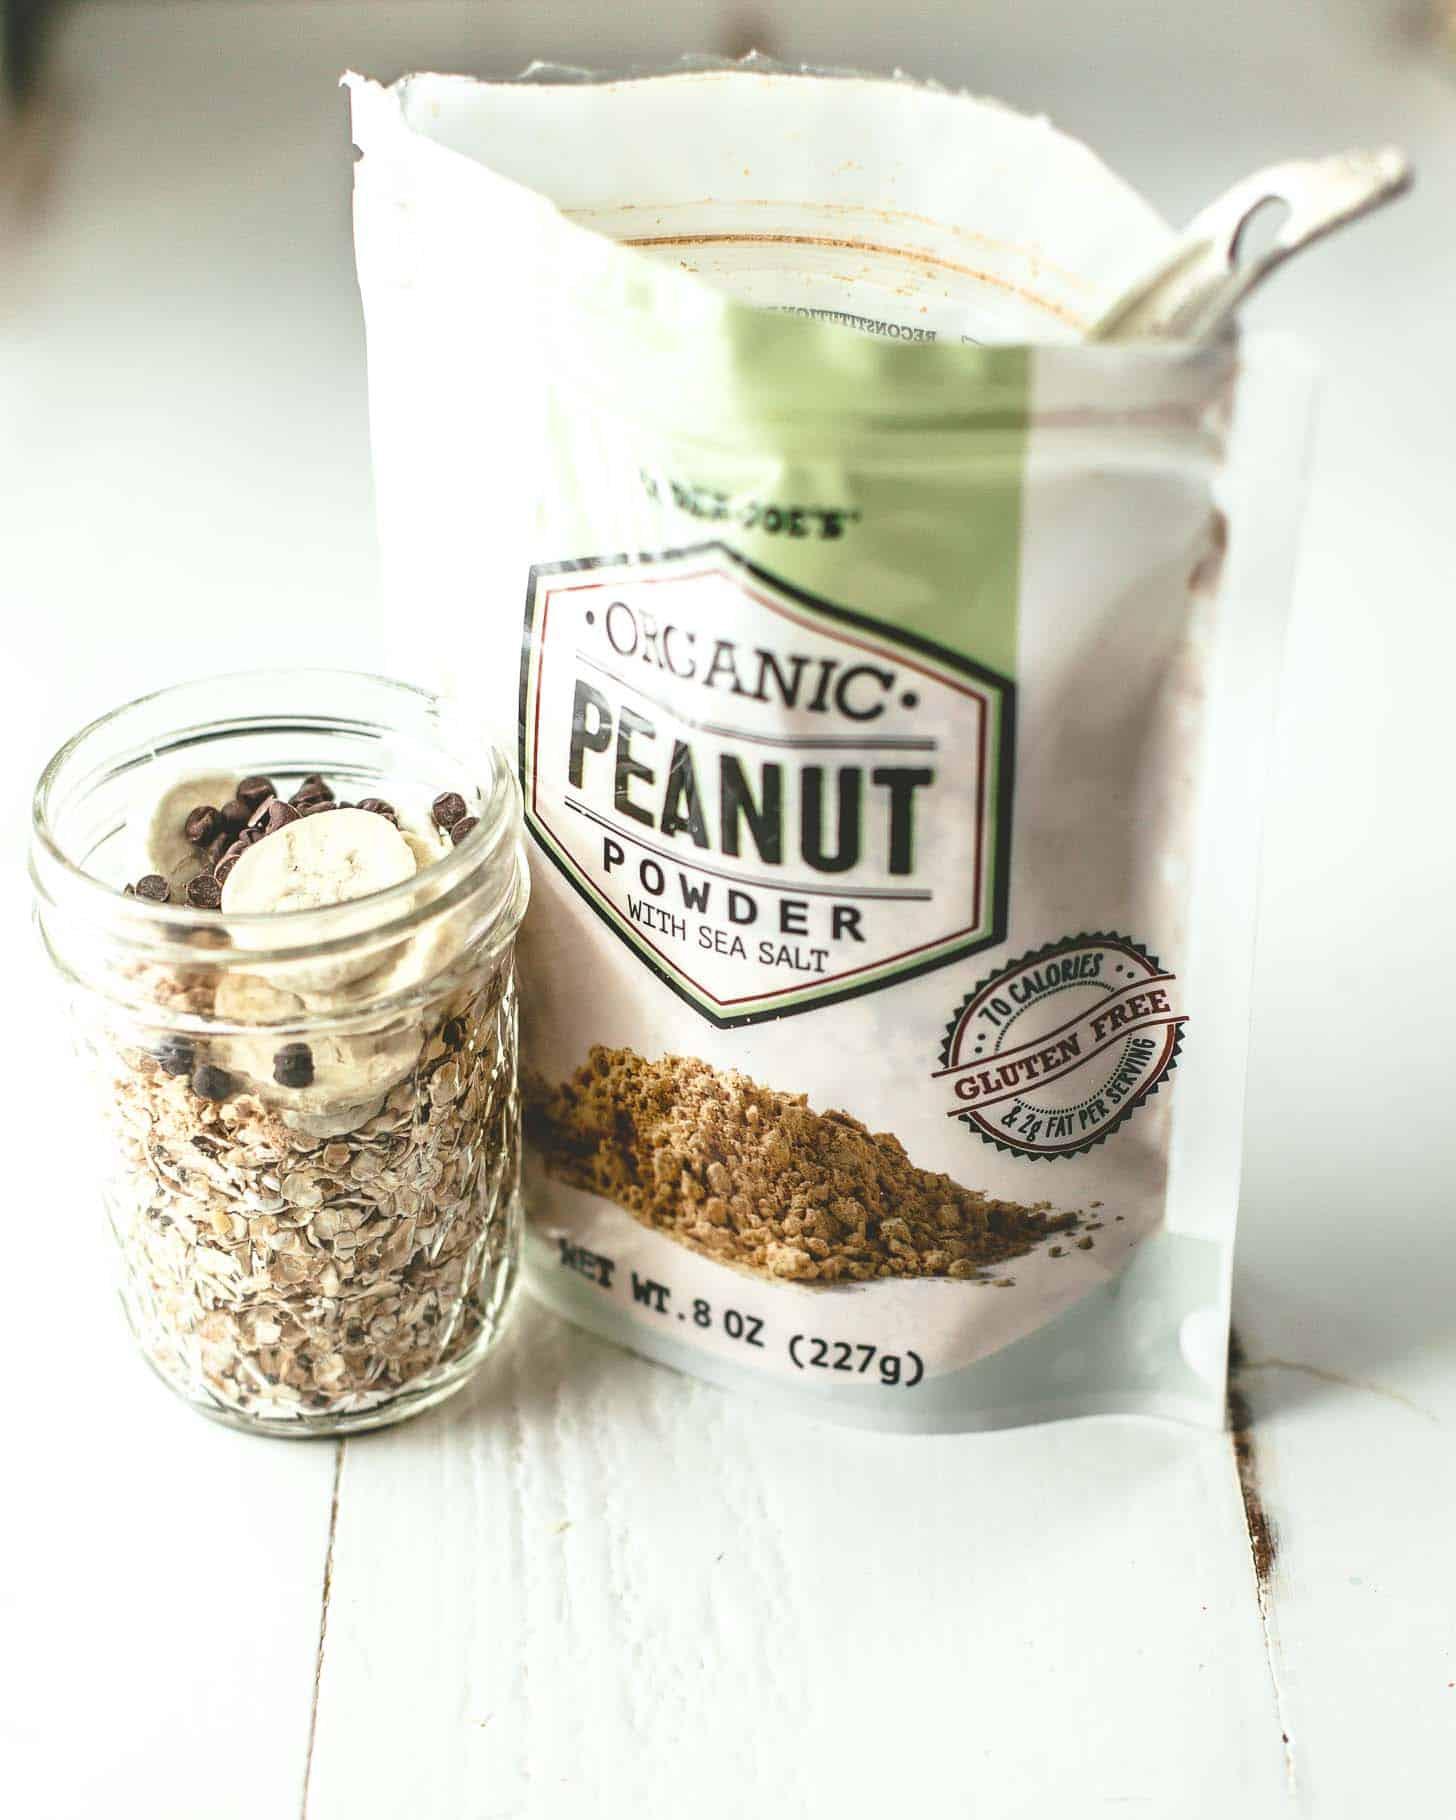 a mason jar of homemade oatmeal next to a bag of peanut powder